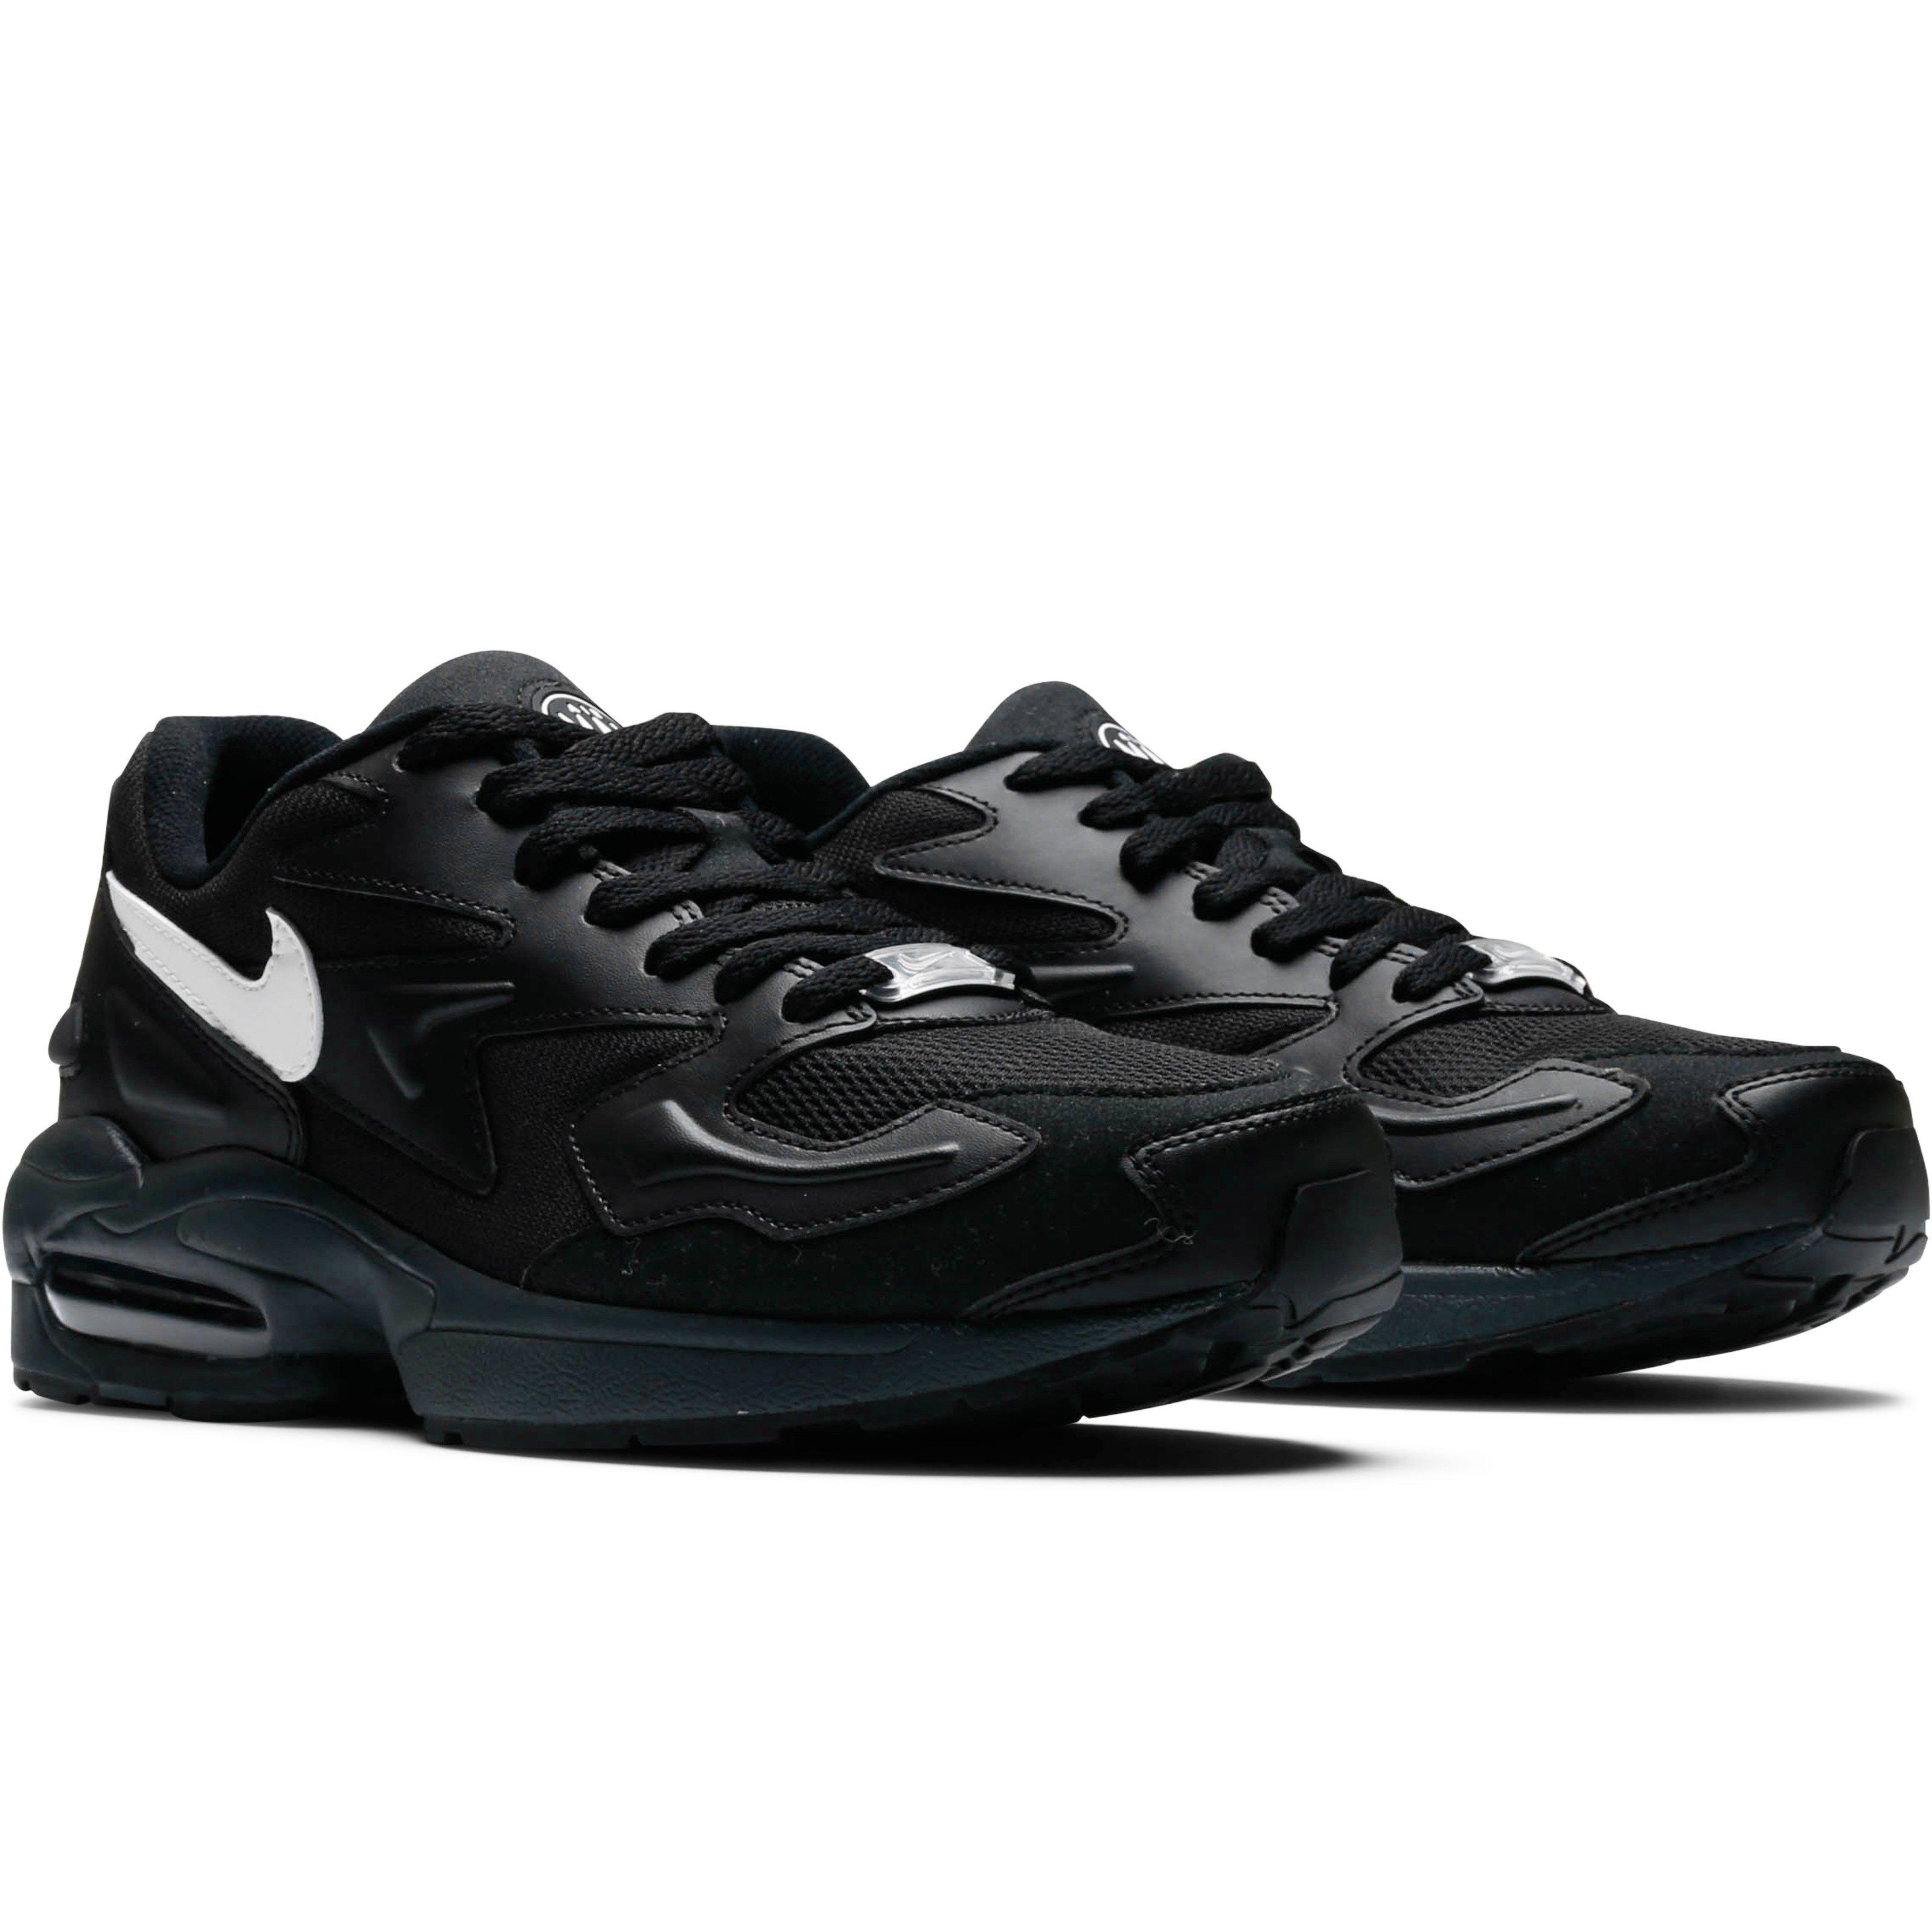 a254bdec8512 Nike - Black Air Max2 Light for Men - Lyst. View fullscreen